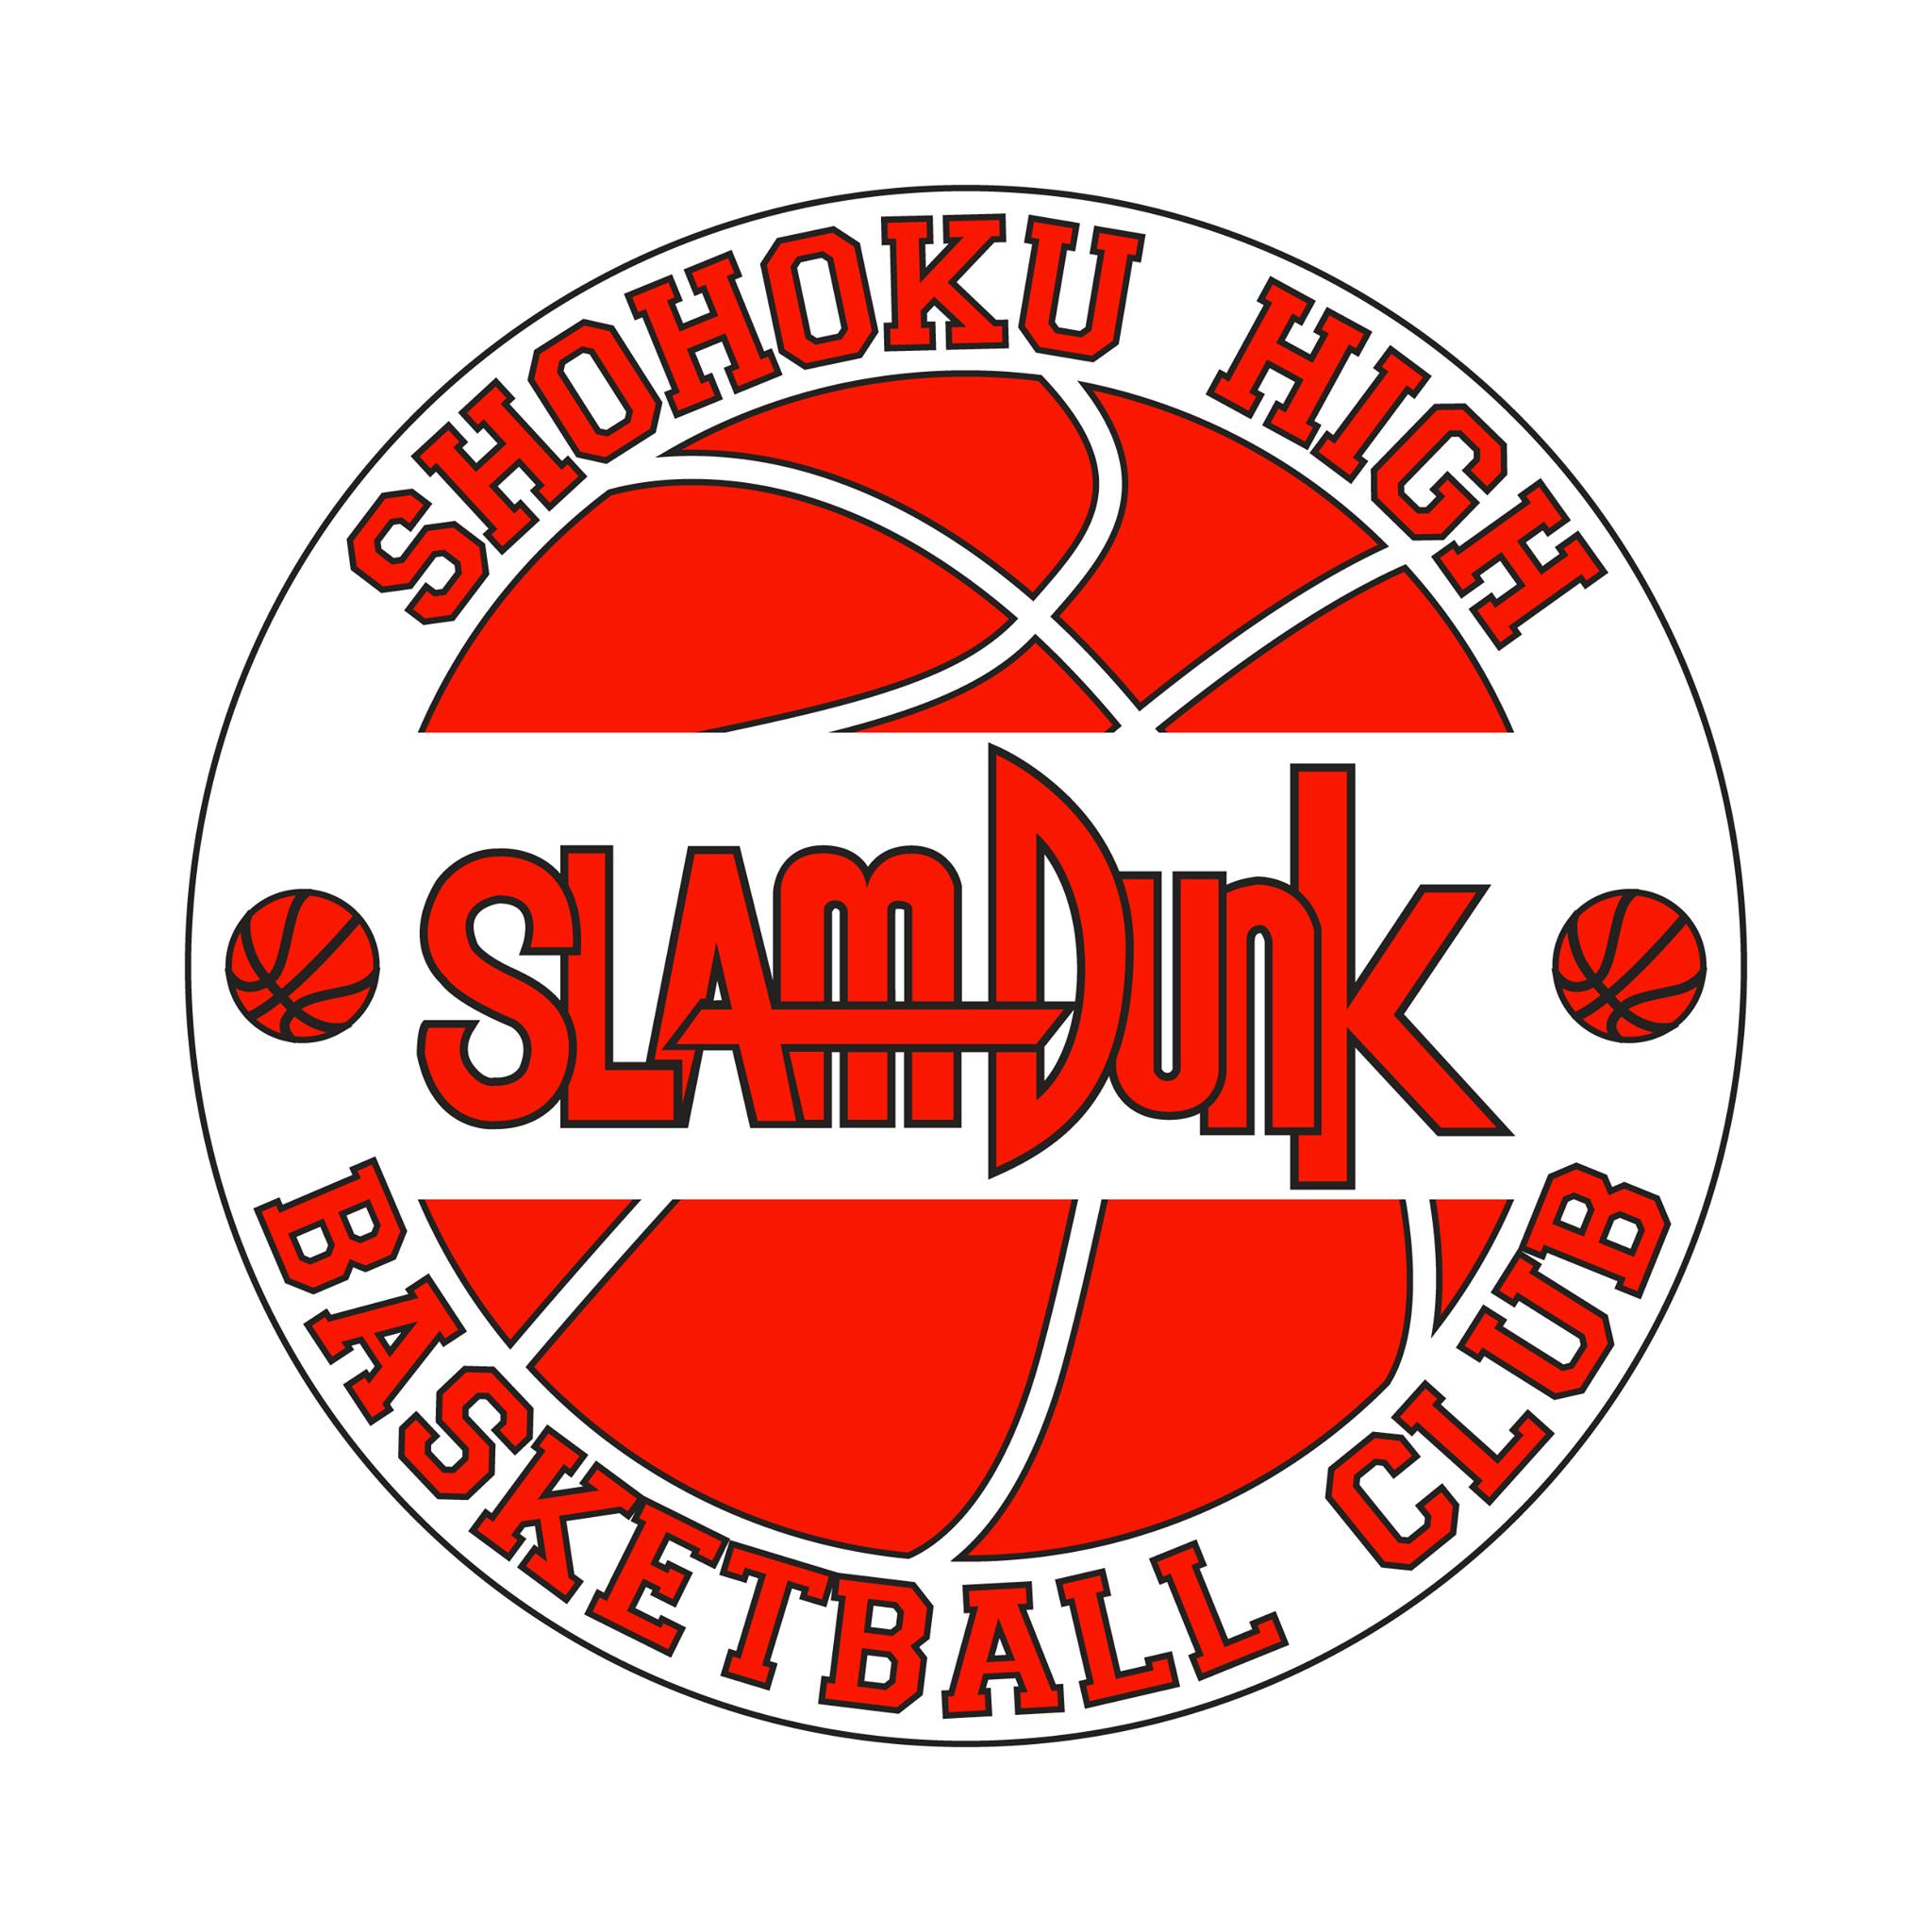 Shohoku High Basketball Club Logo